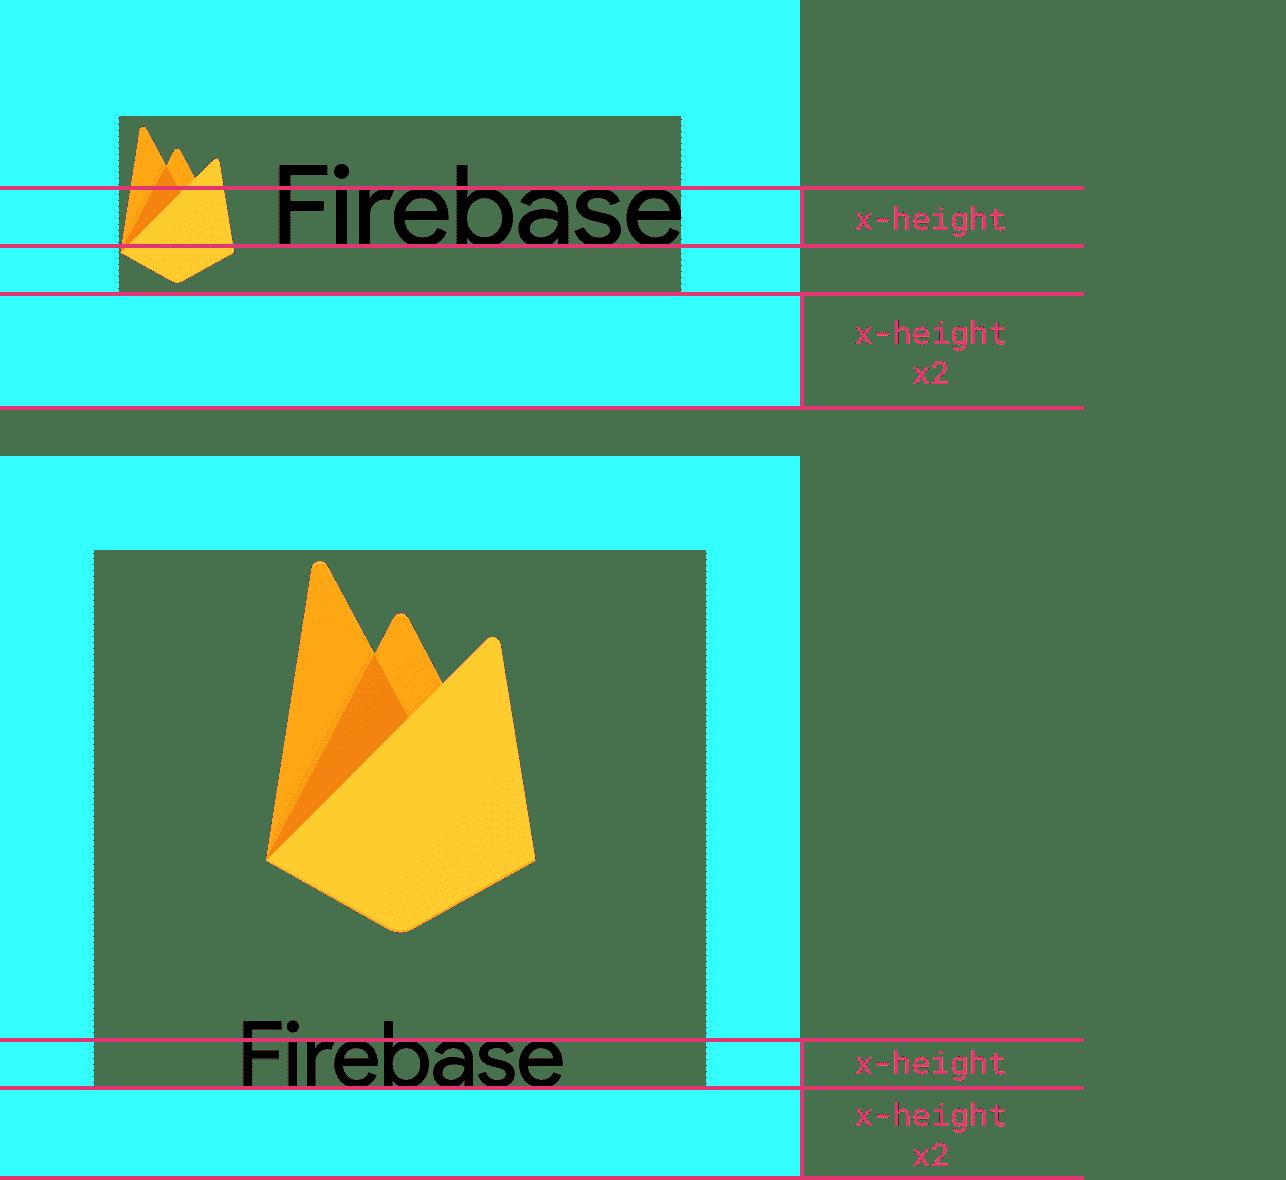 Contoh logo Firebase dengan tinggi minimal 2 kali tinggi logo